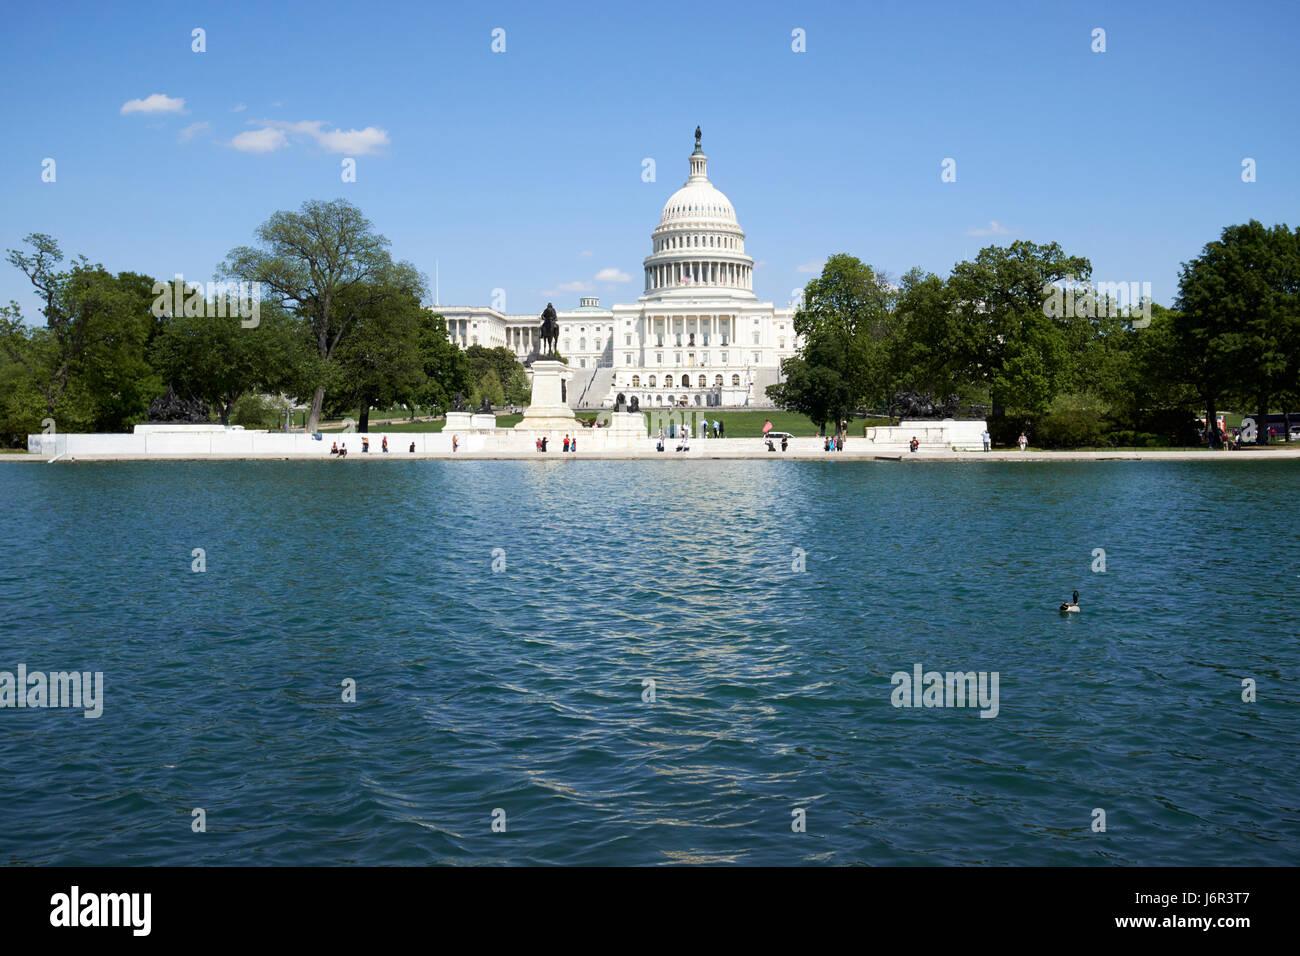 United States Capitol building and capitol reflecting pool Washington DC USA - Stock Image